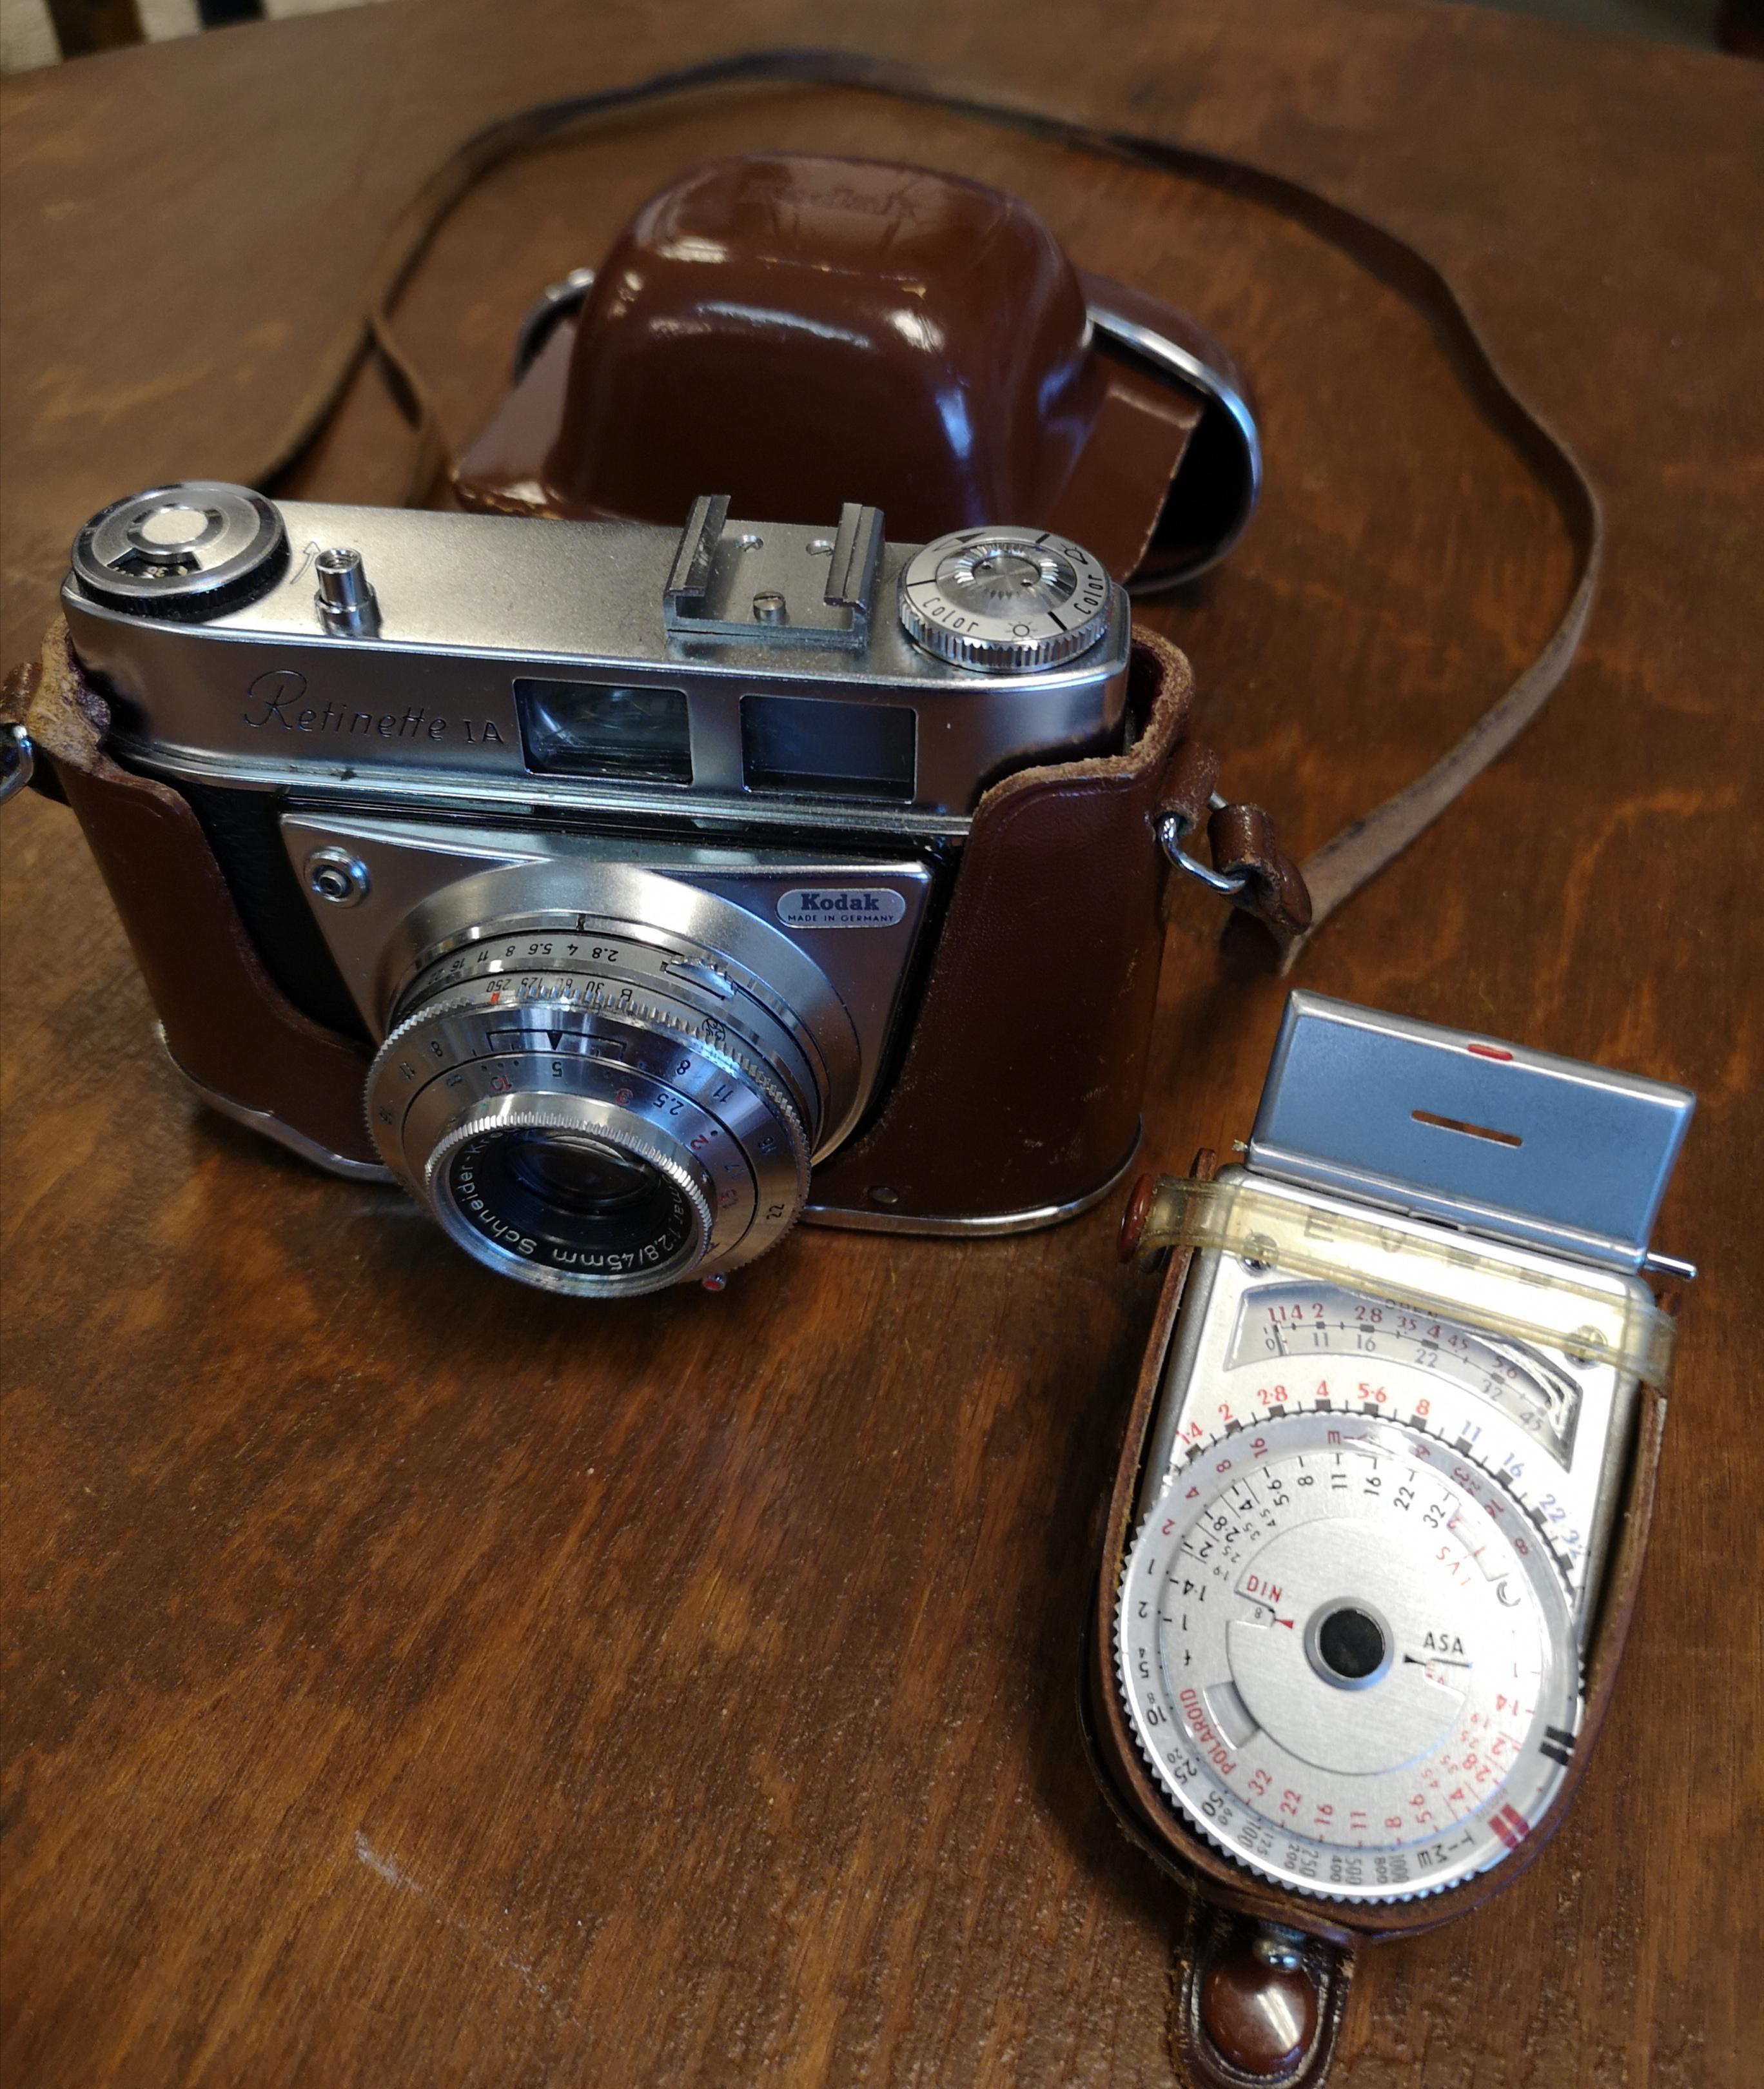 Kodak Retinette 1A ja valotusmittari